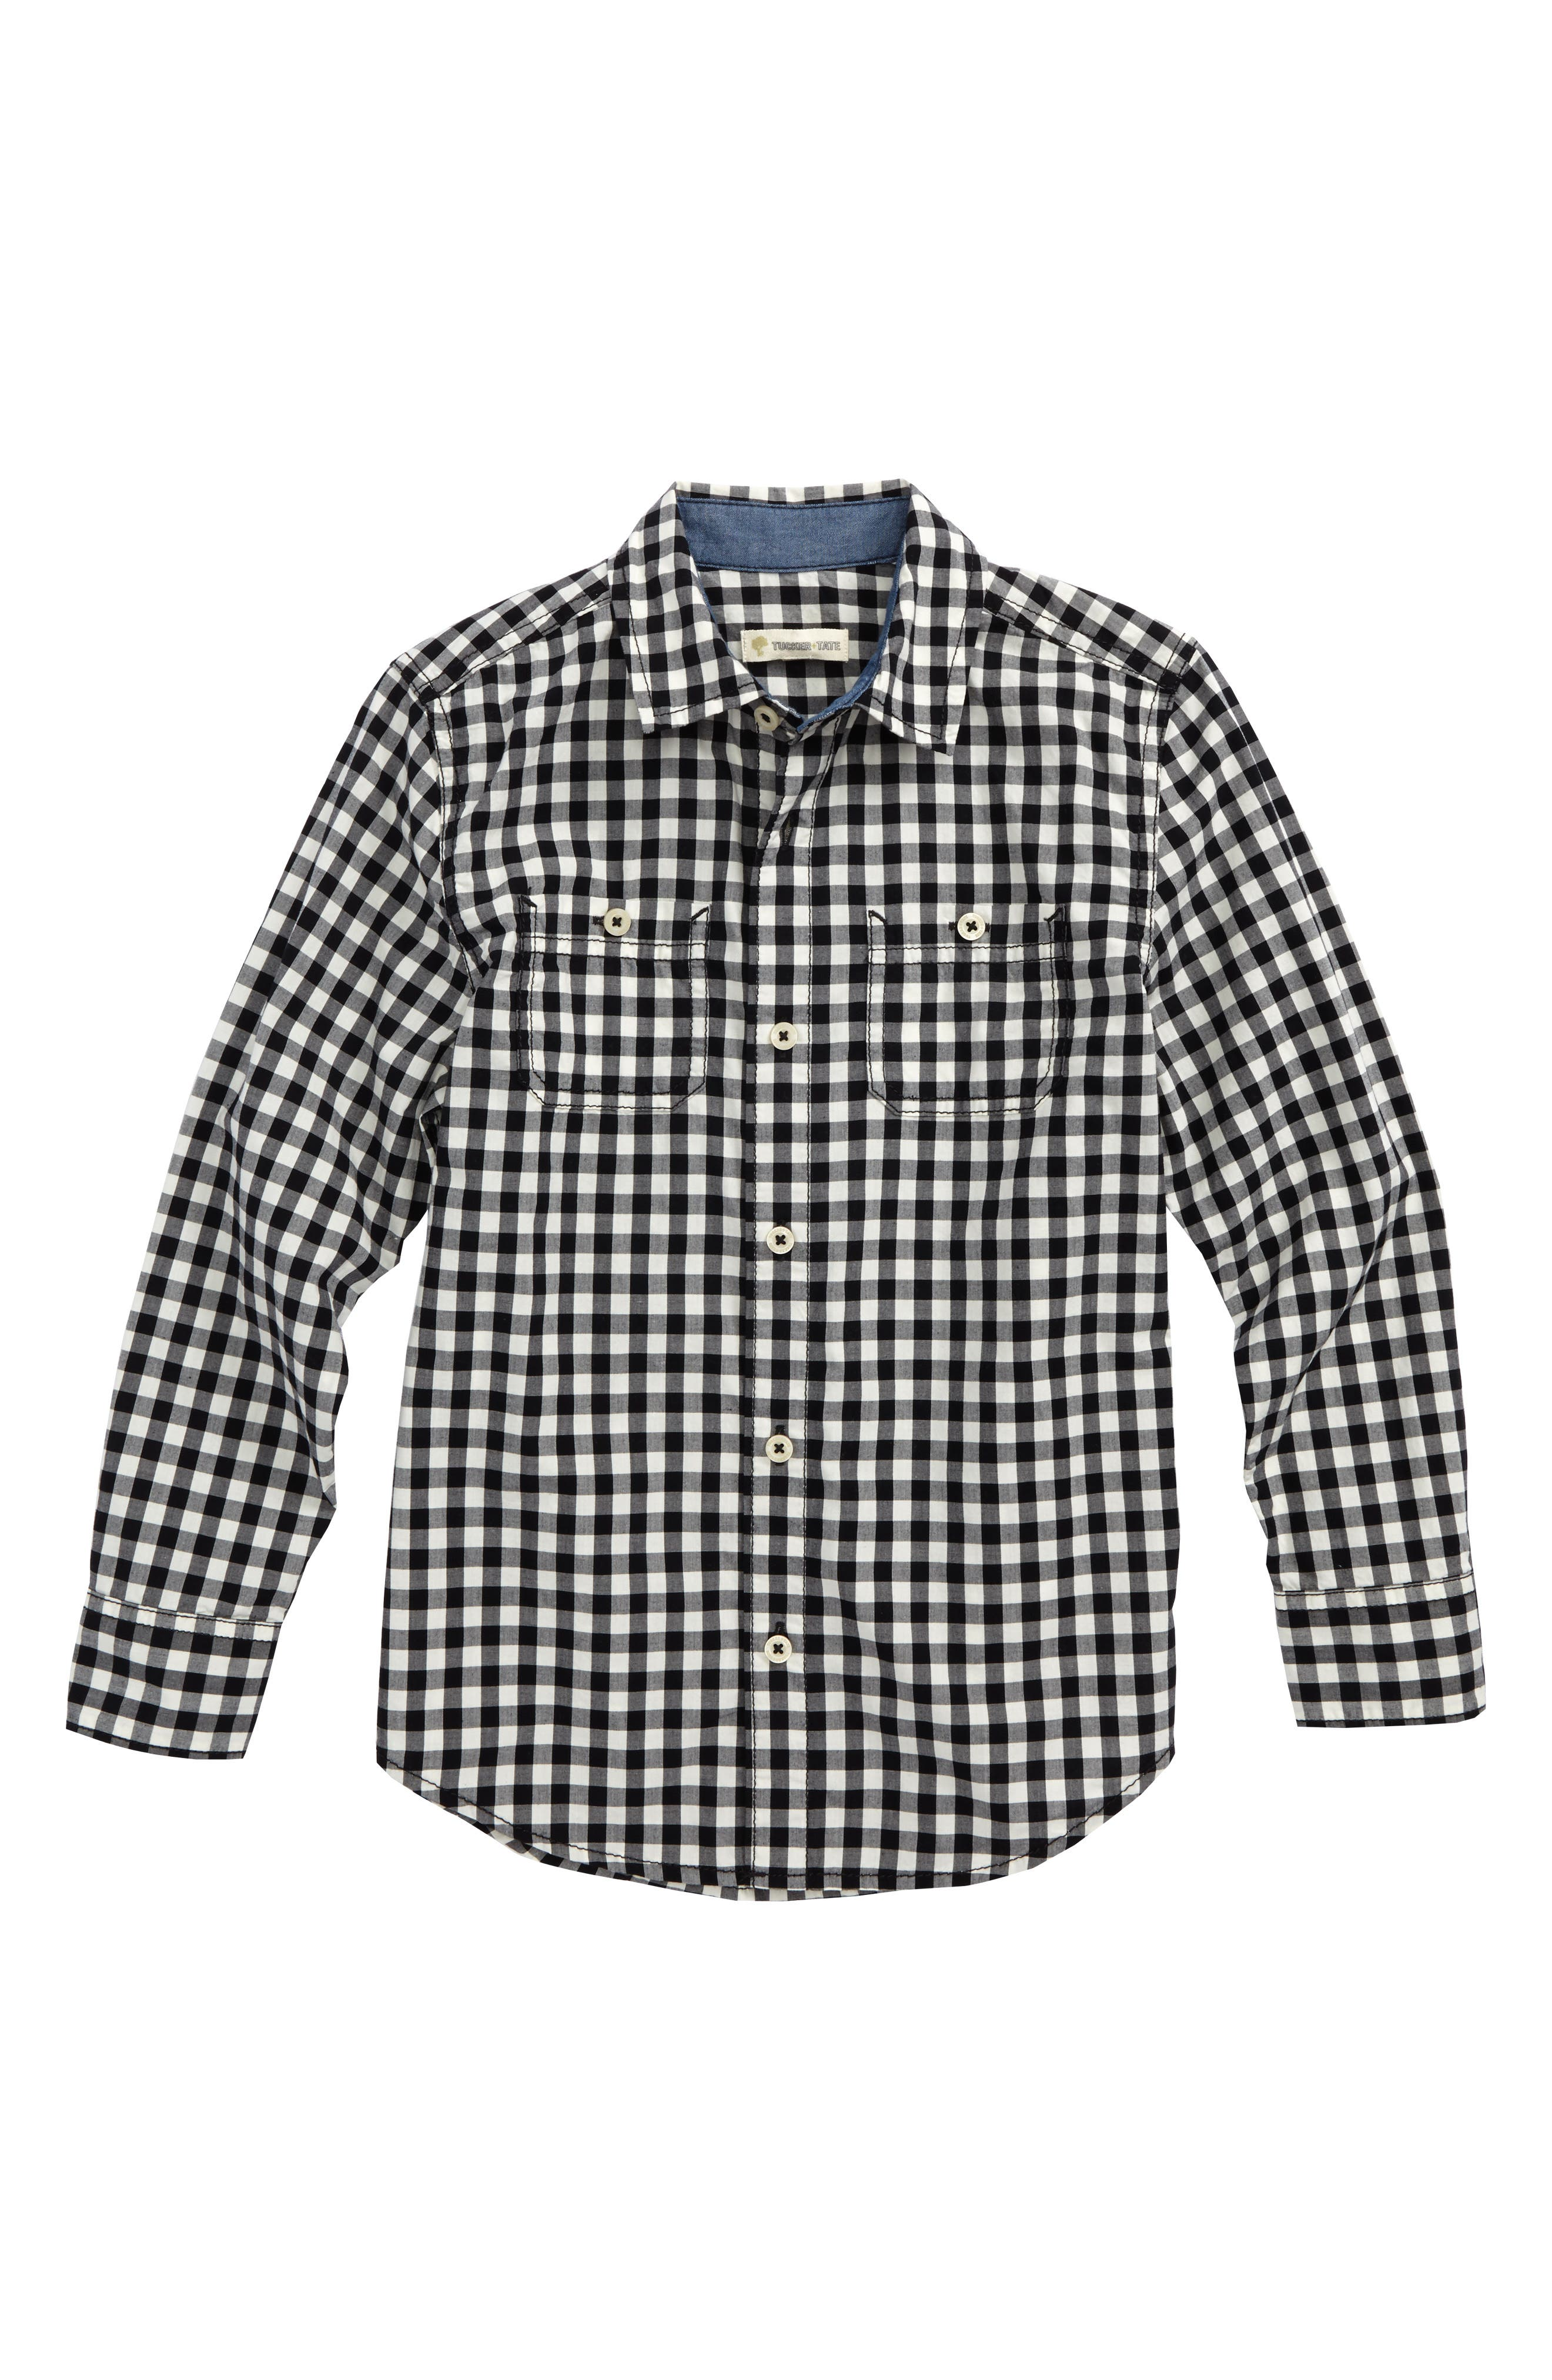 Main Image - Tucker + Tate 'Photo' Buffalo Plaid Woven Shirt (Little Boys)